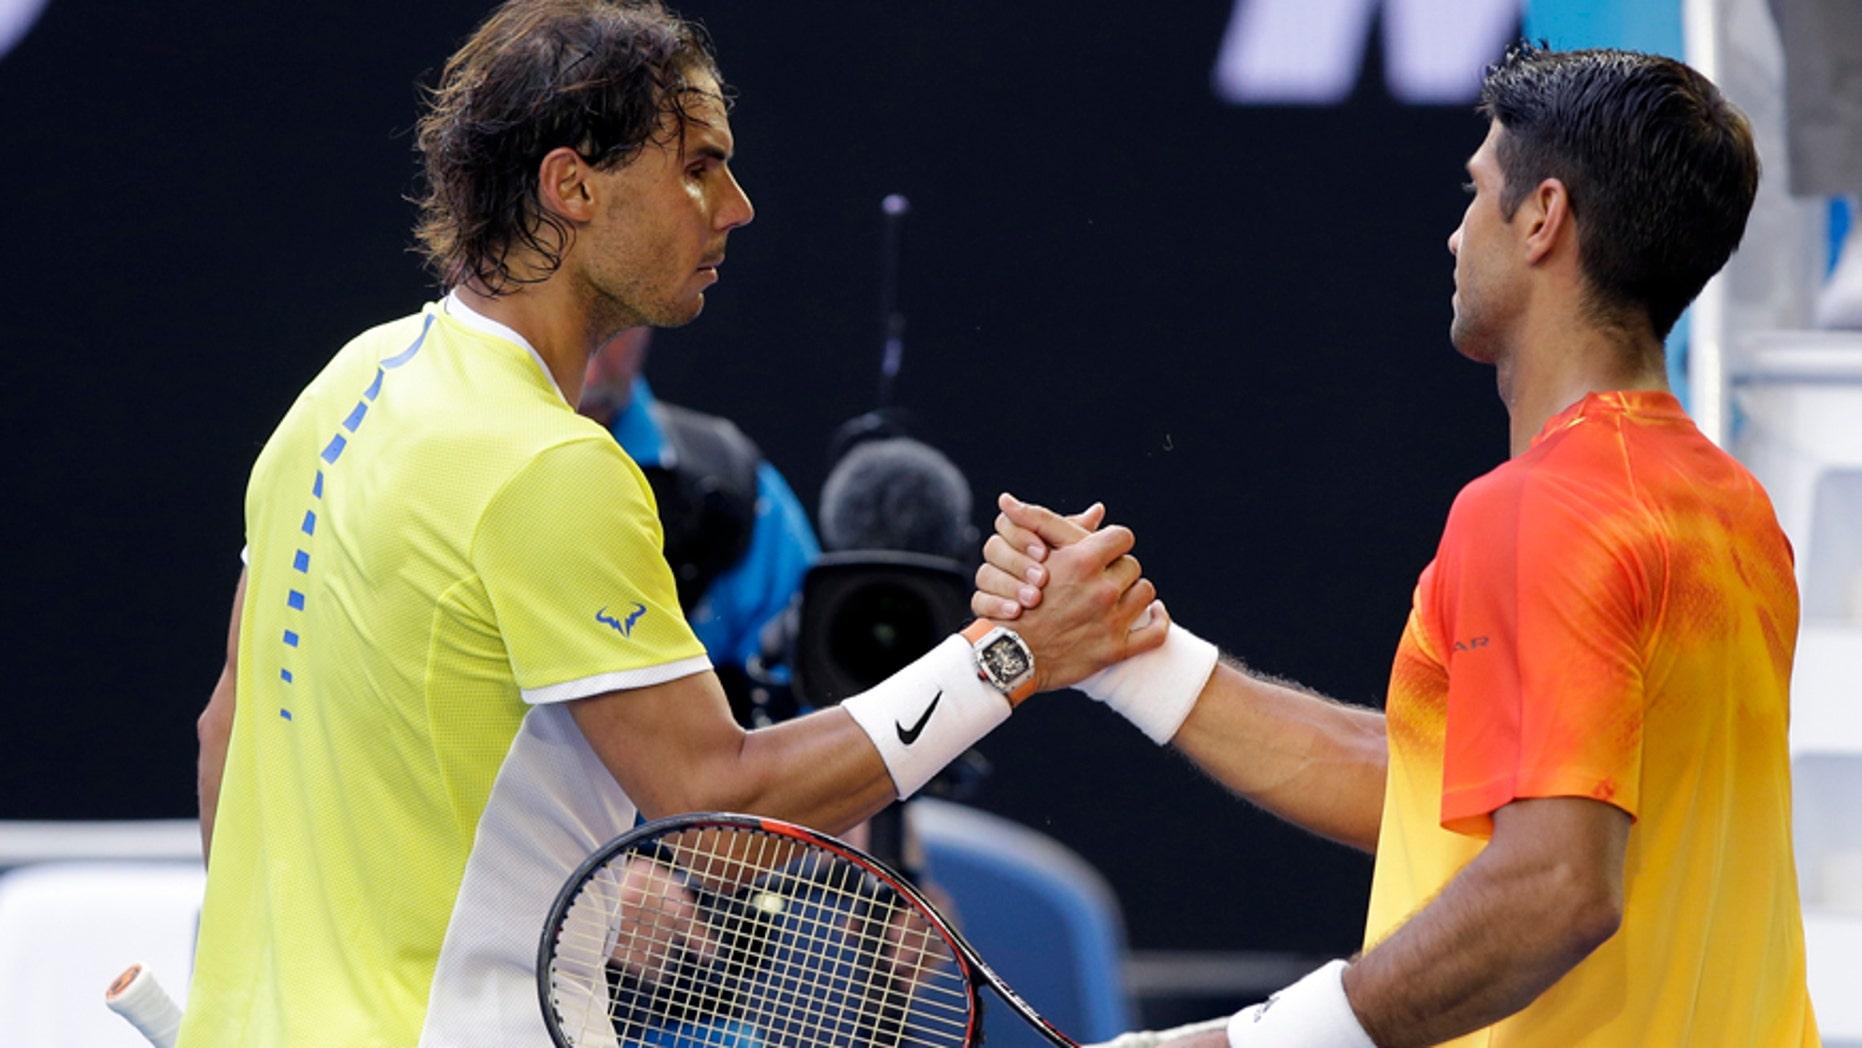 Jan. 19, 2016: Rafael Nadal, left, of Spain congratulates compatriot Fernando Verdasco after their first round match at the Australian Open tennis championships in Melbourne, Australia.